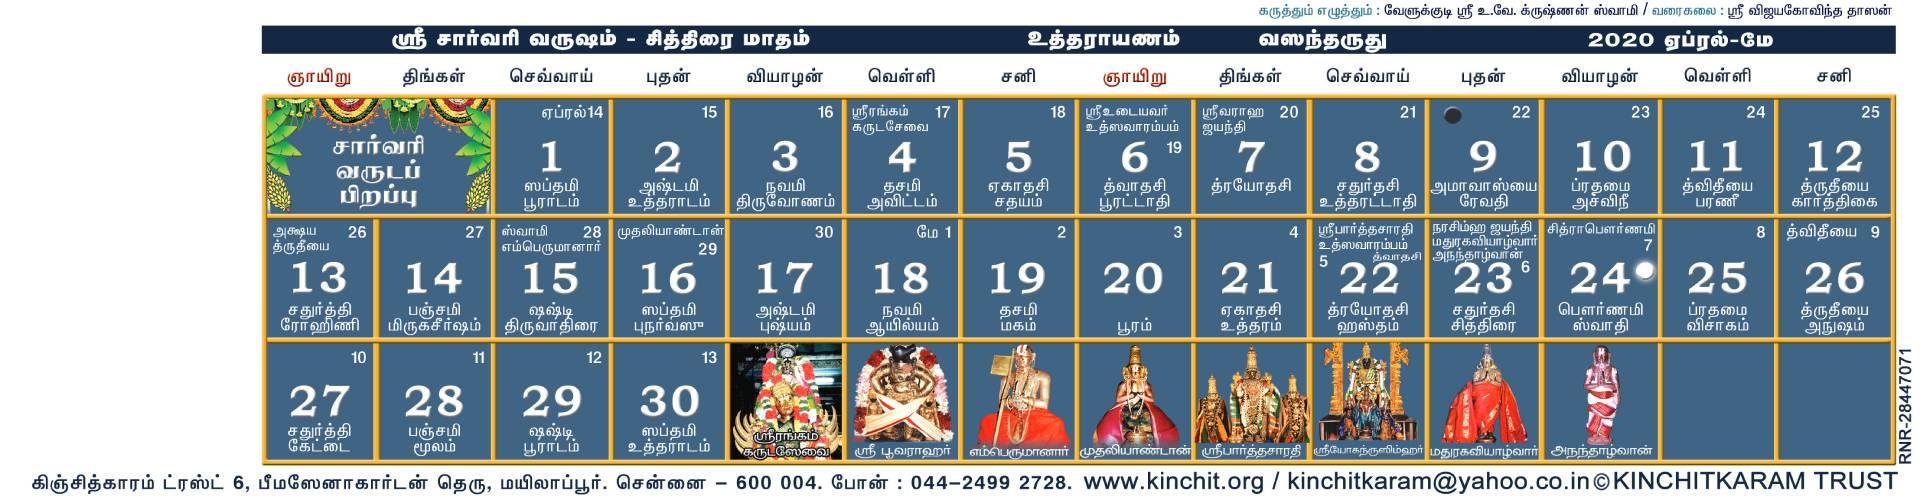 Chithrai-2020 Tamil